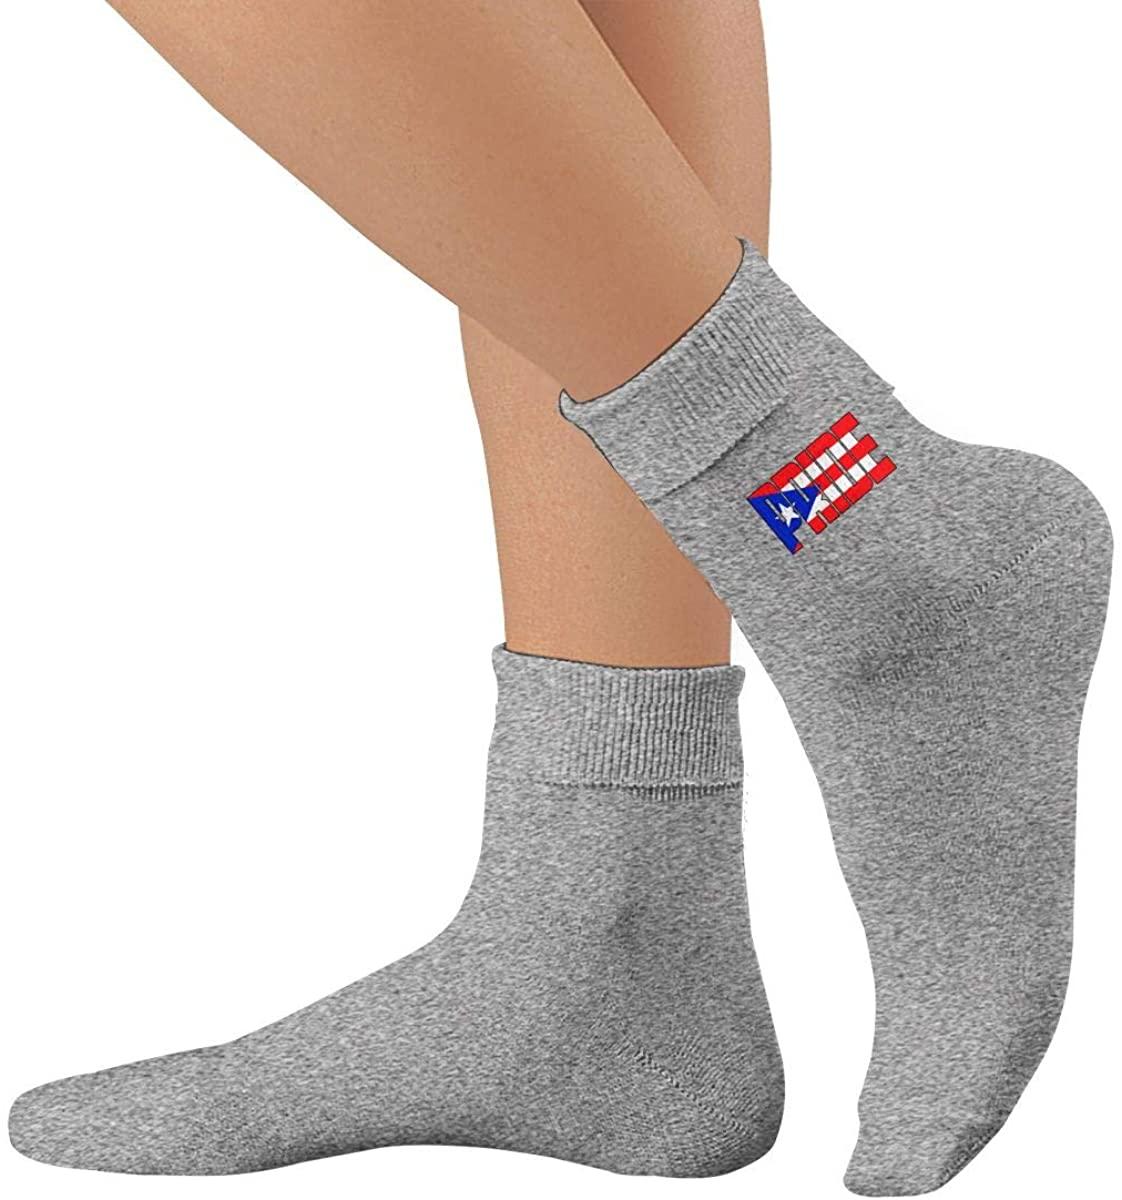 Rich Port City Puerto Rican Pride PR Flag Unisex Thin Cotton Lightly High Ankle Socks